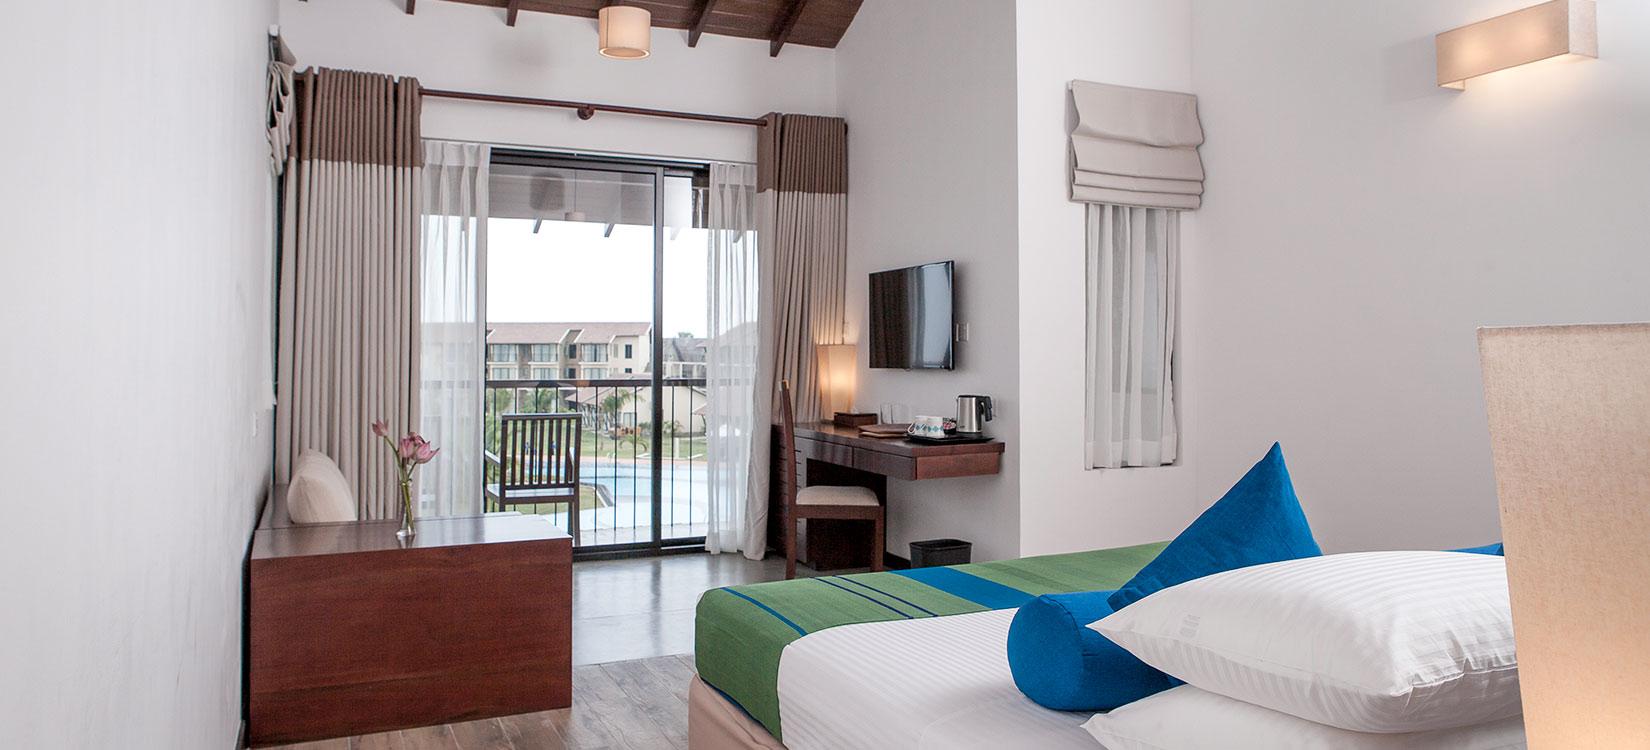 The Calm Resort & Spa delux